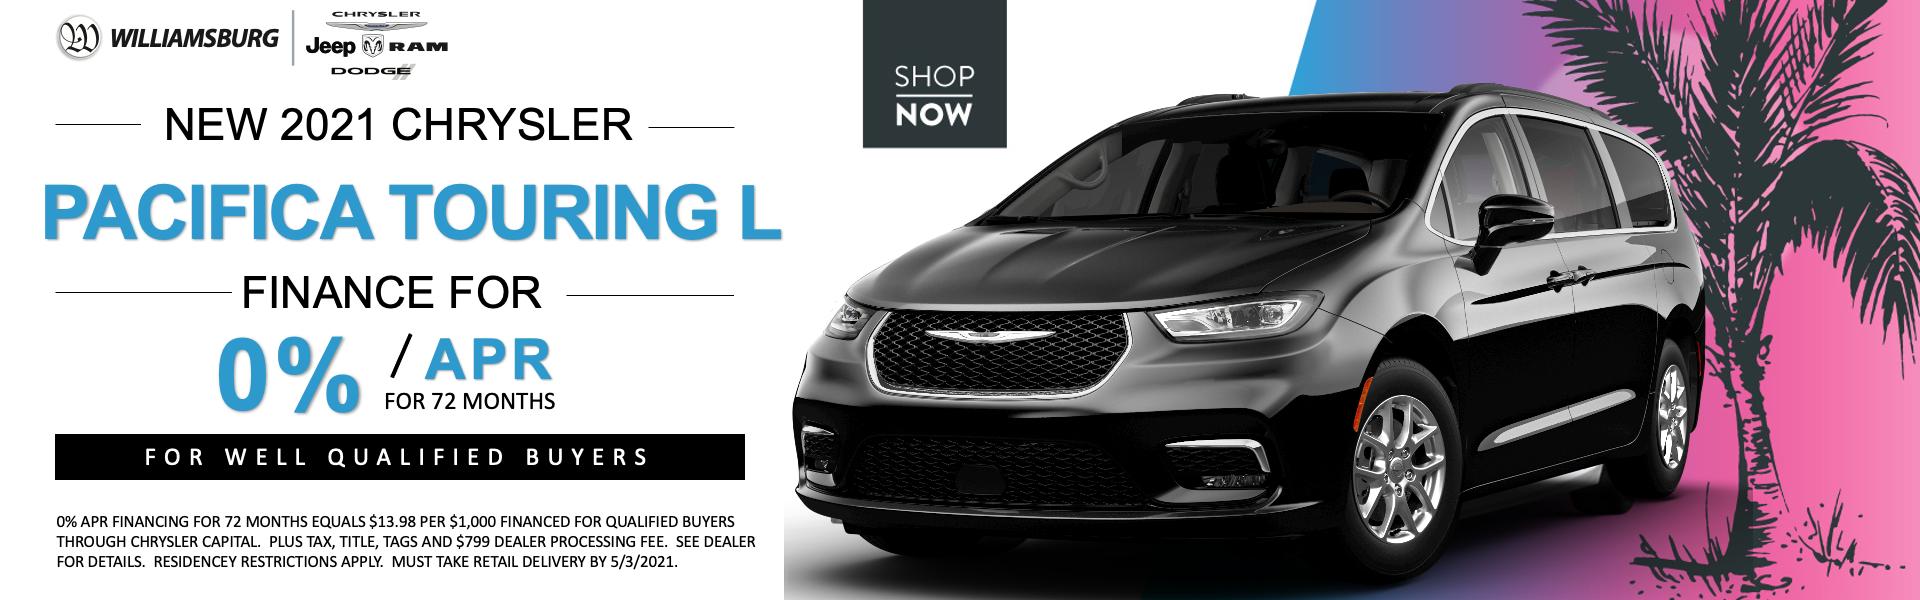 2020 Chrysler Pacifica April Offer